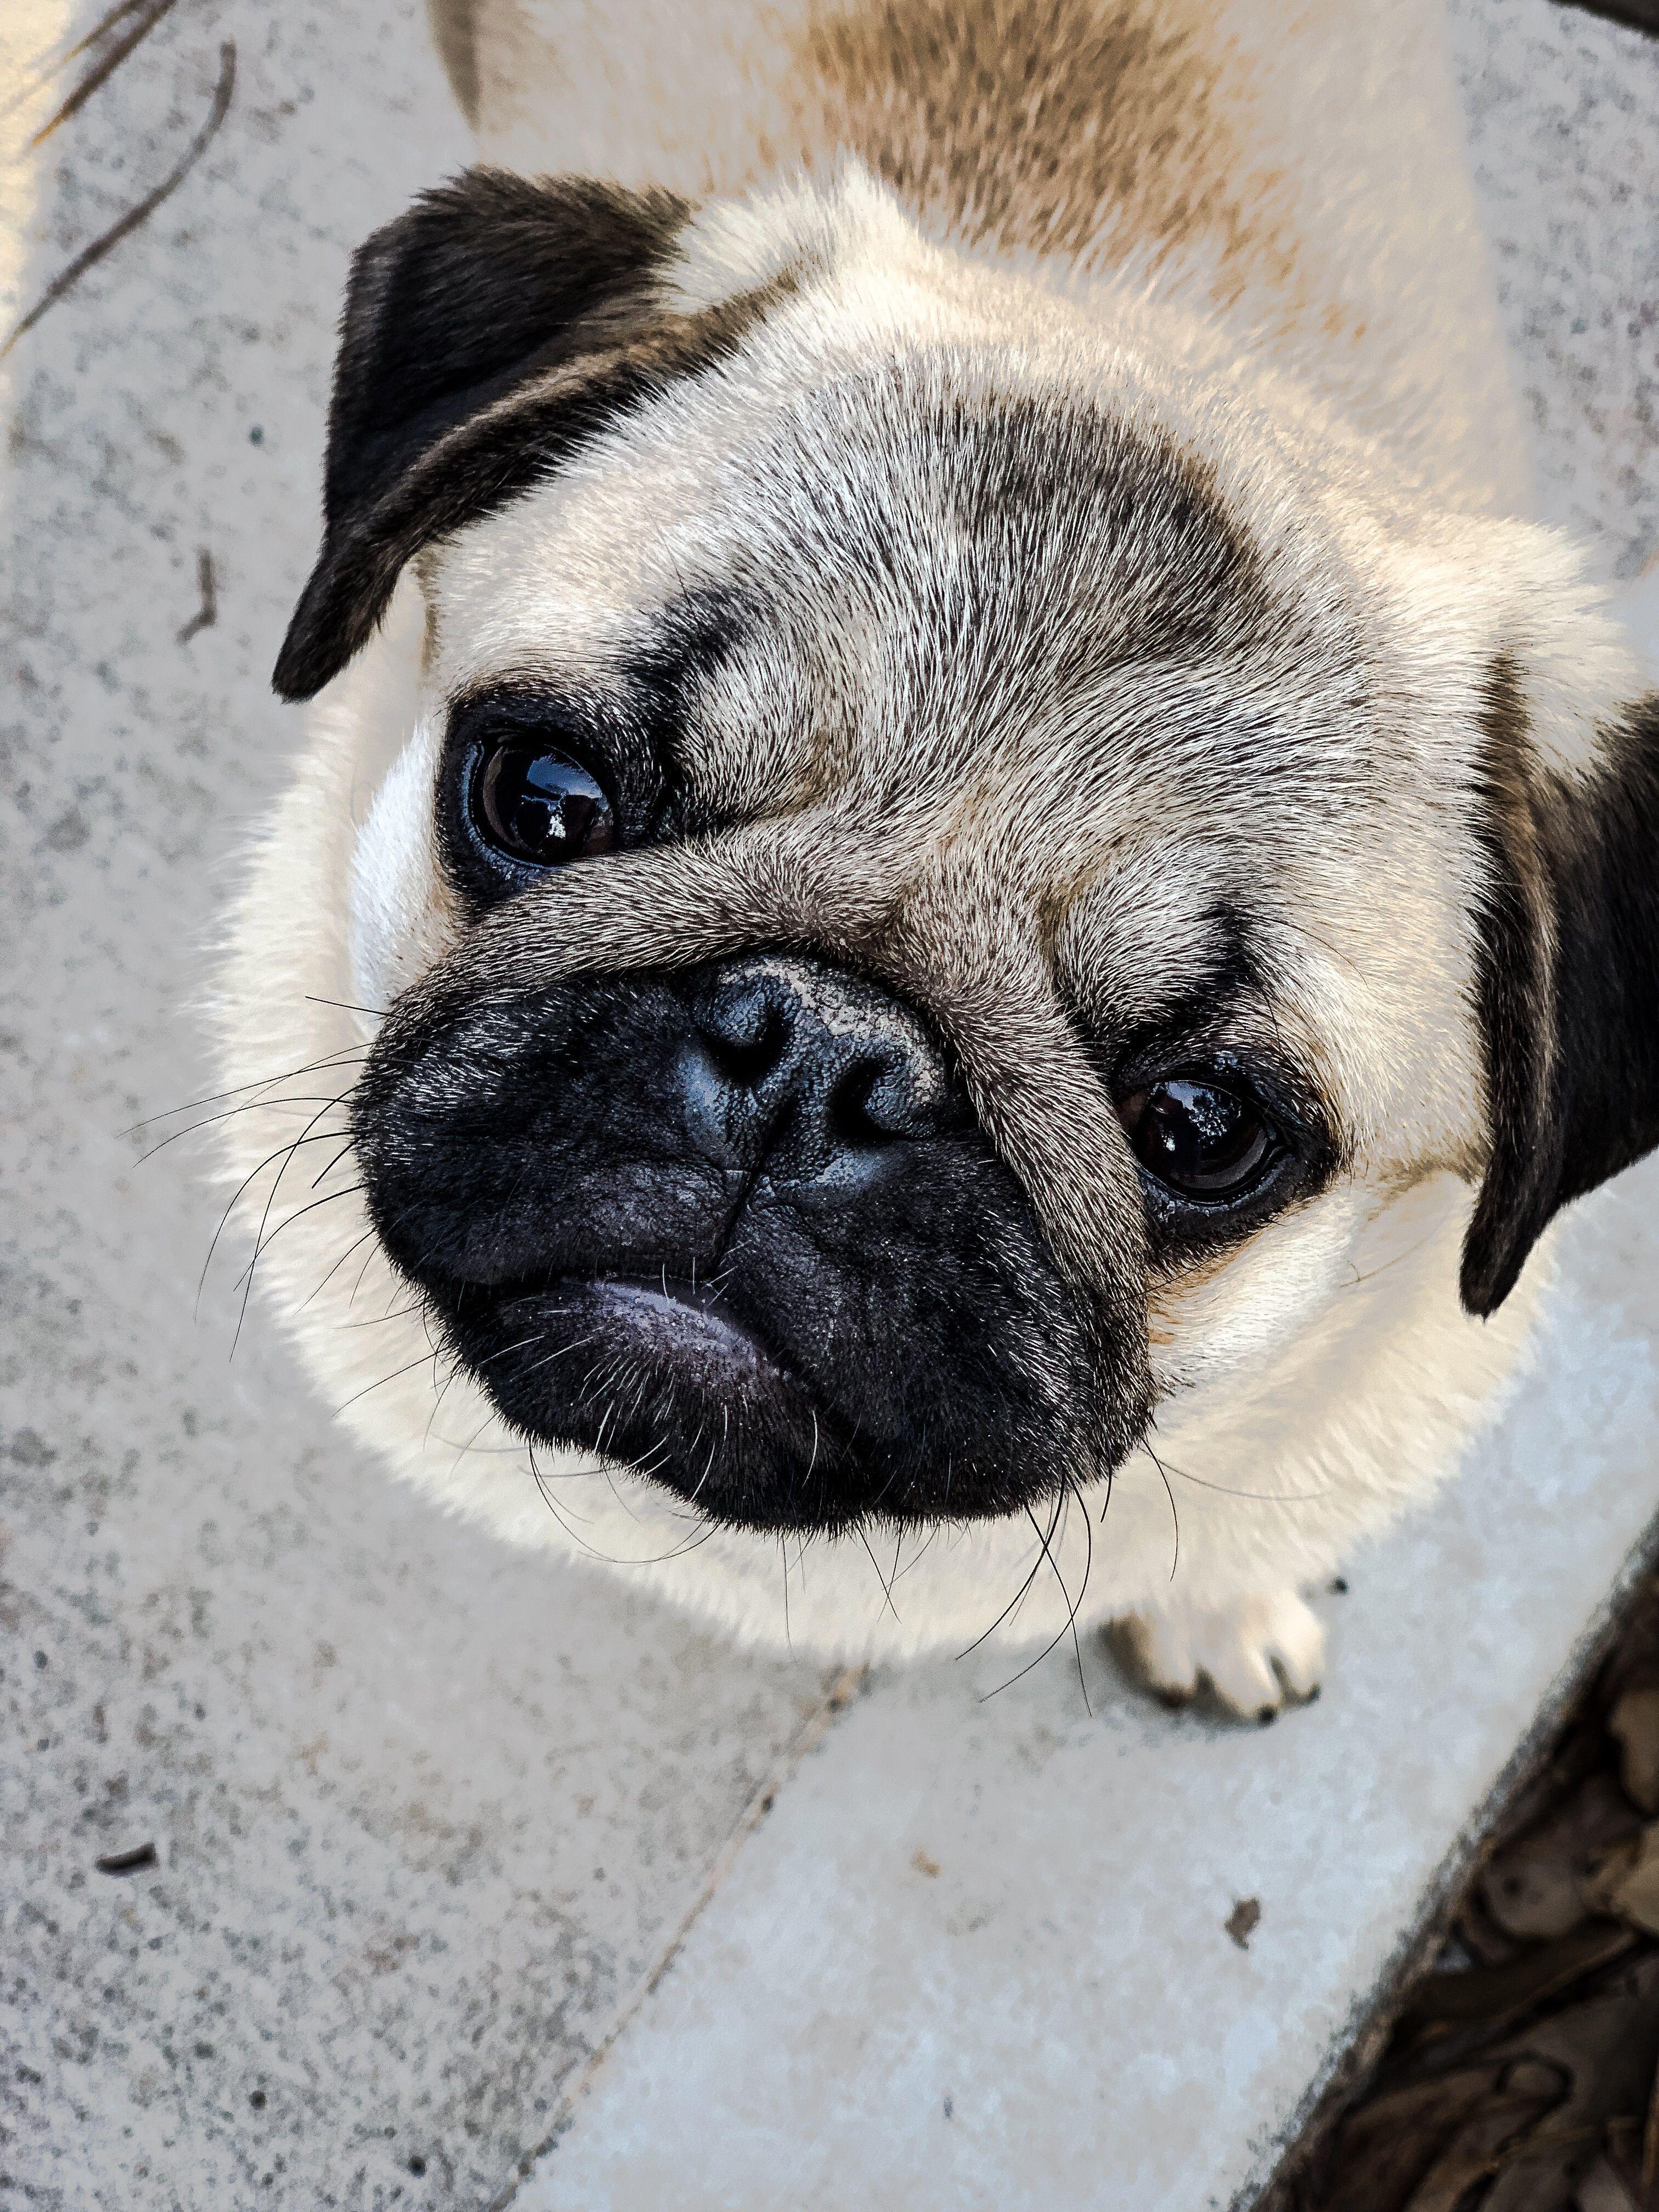 Baby Pugs Image By Nana Covington On Pugs Pugs And More Pugs